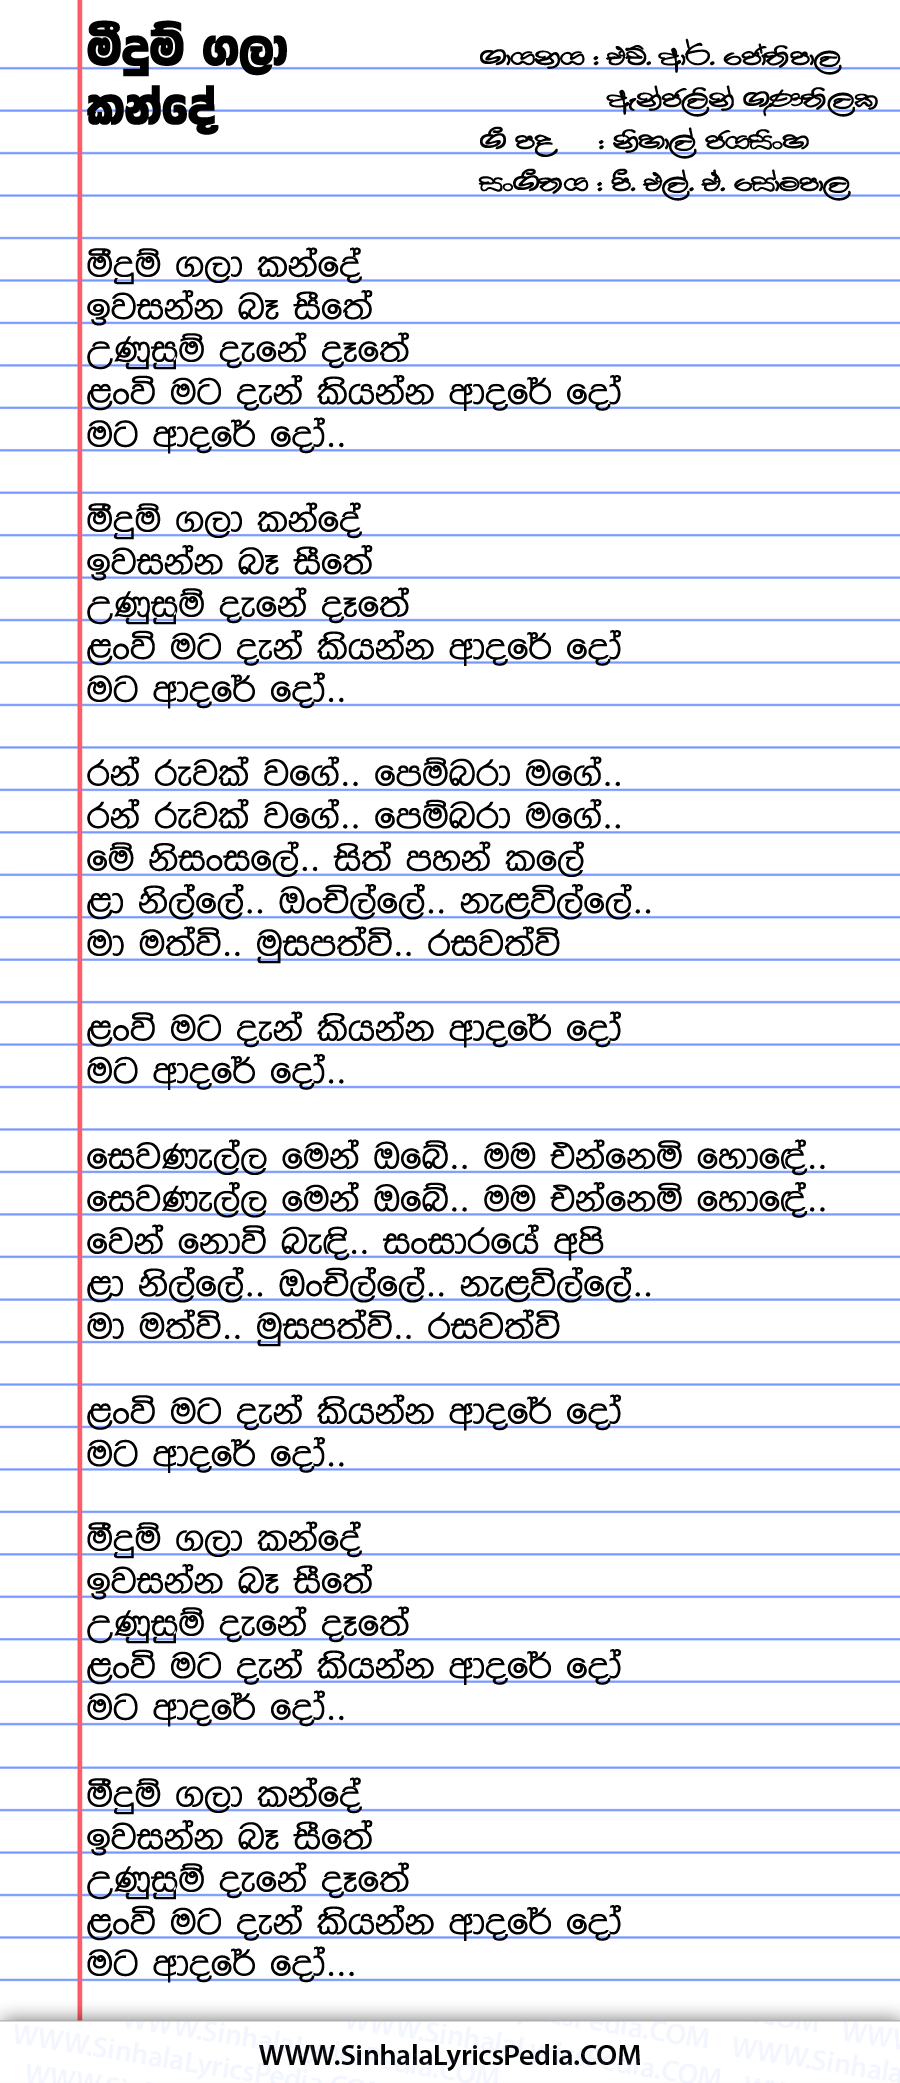 Meedum Gala Kande Song Lyrics